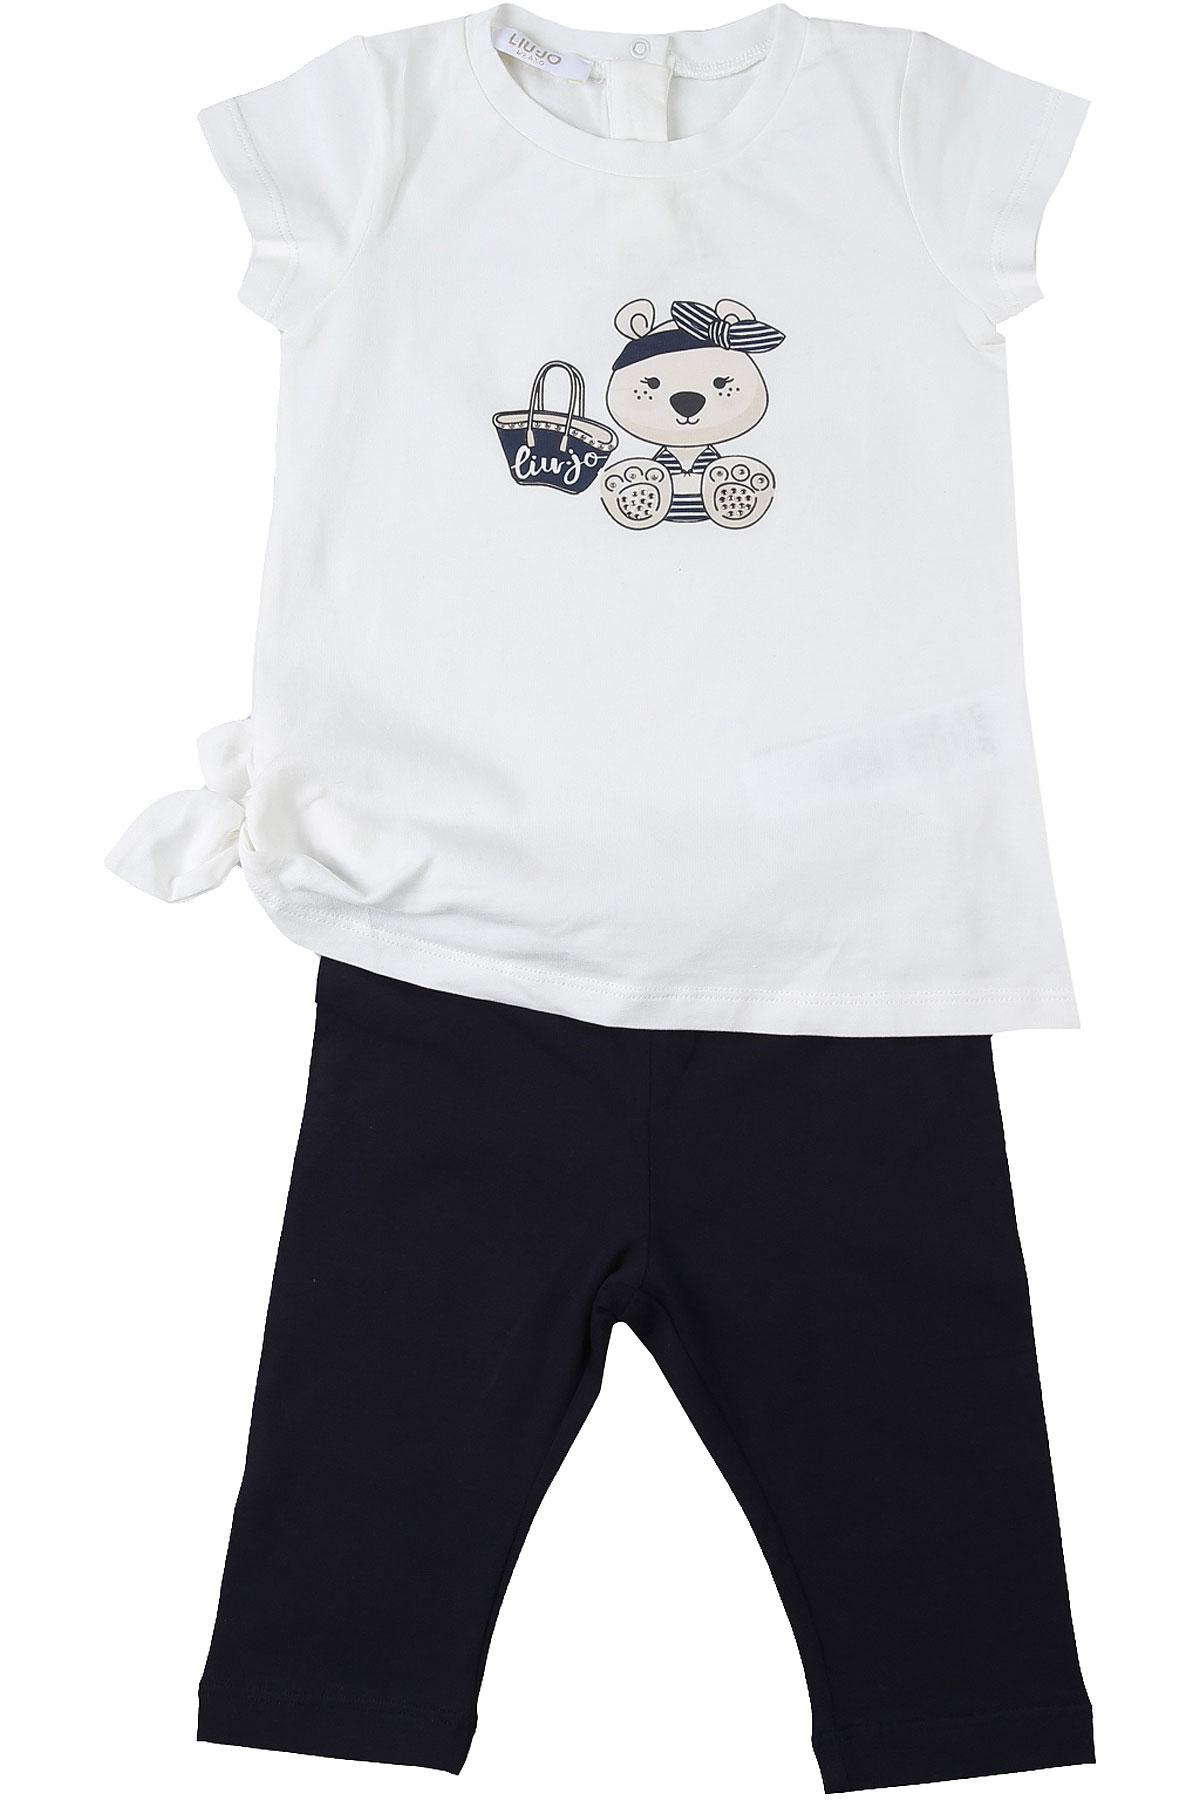 Liu Jo Baby Sets for Girls On Sale, White, Cotton, 2019, 12M 18M 3M 6M